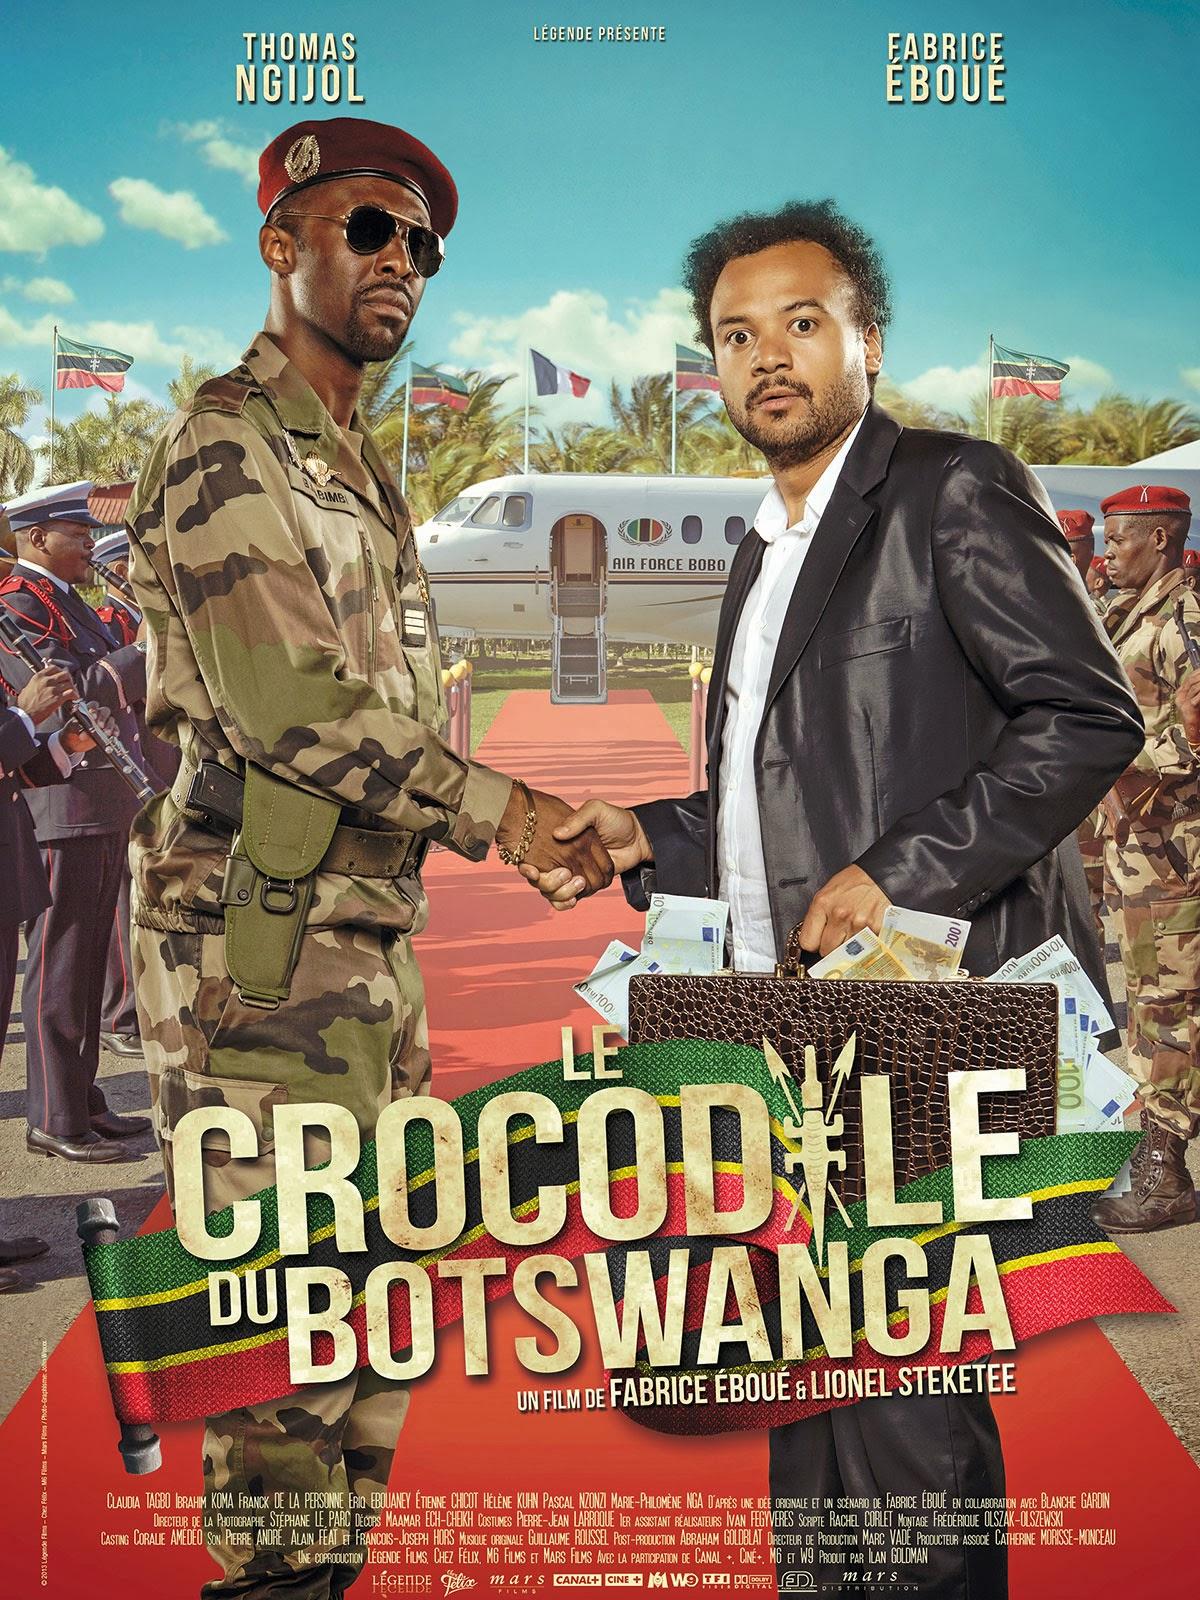 http://fuckingcinephiles.blogspot.fr/2014/02/critique-le-crocodile-du-botswanga.html